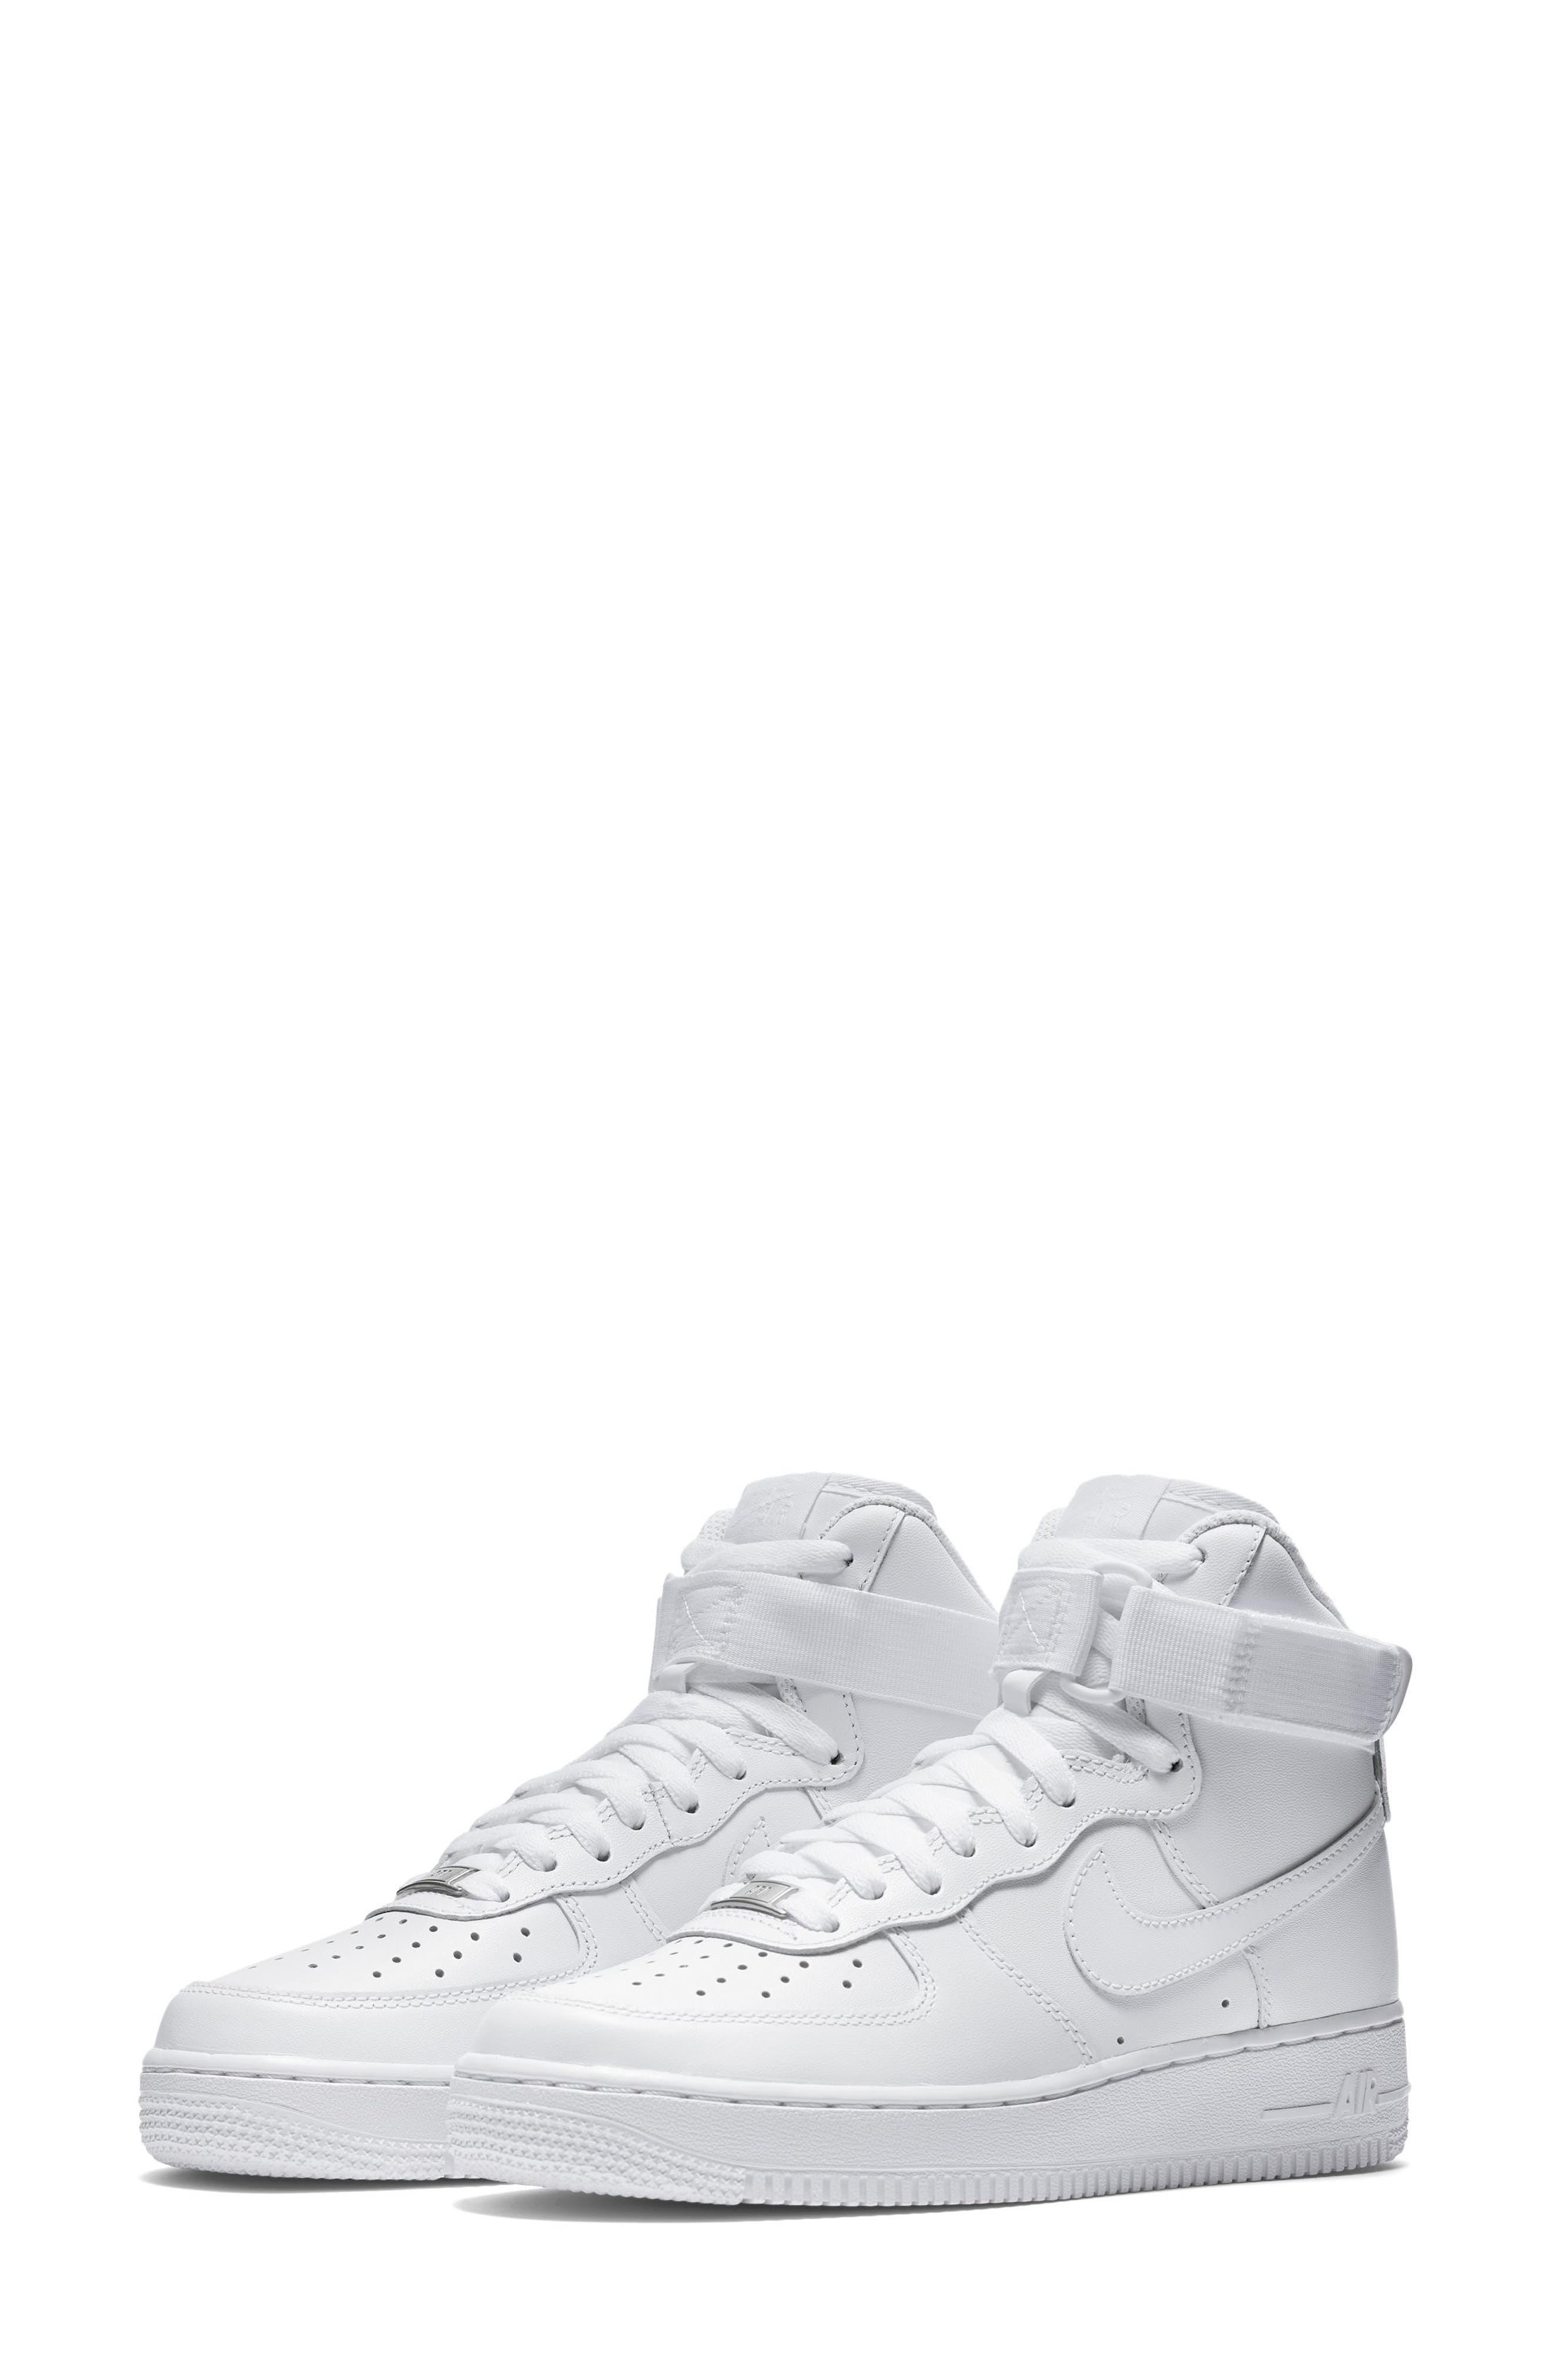 Air Force 1 High Top Sneaker